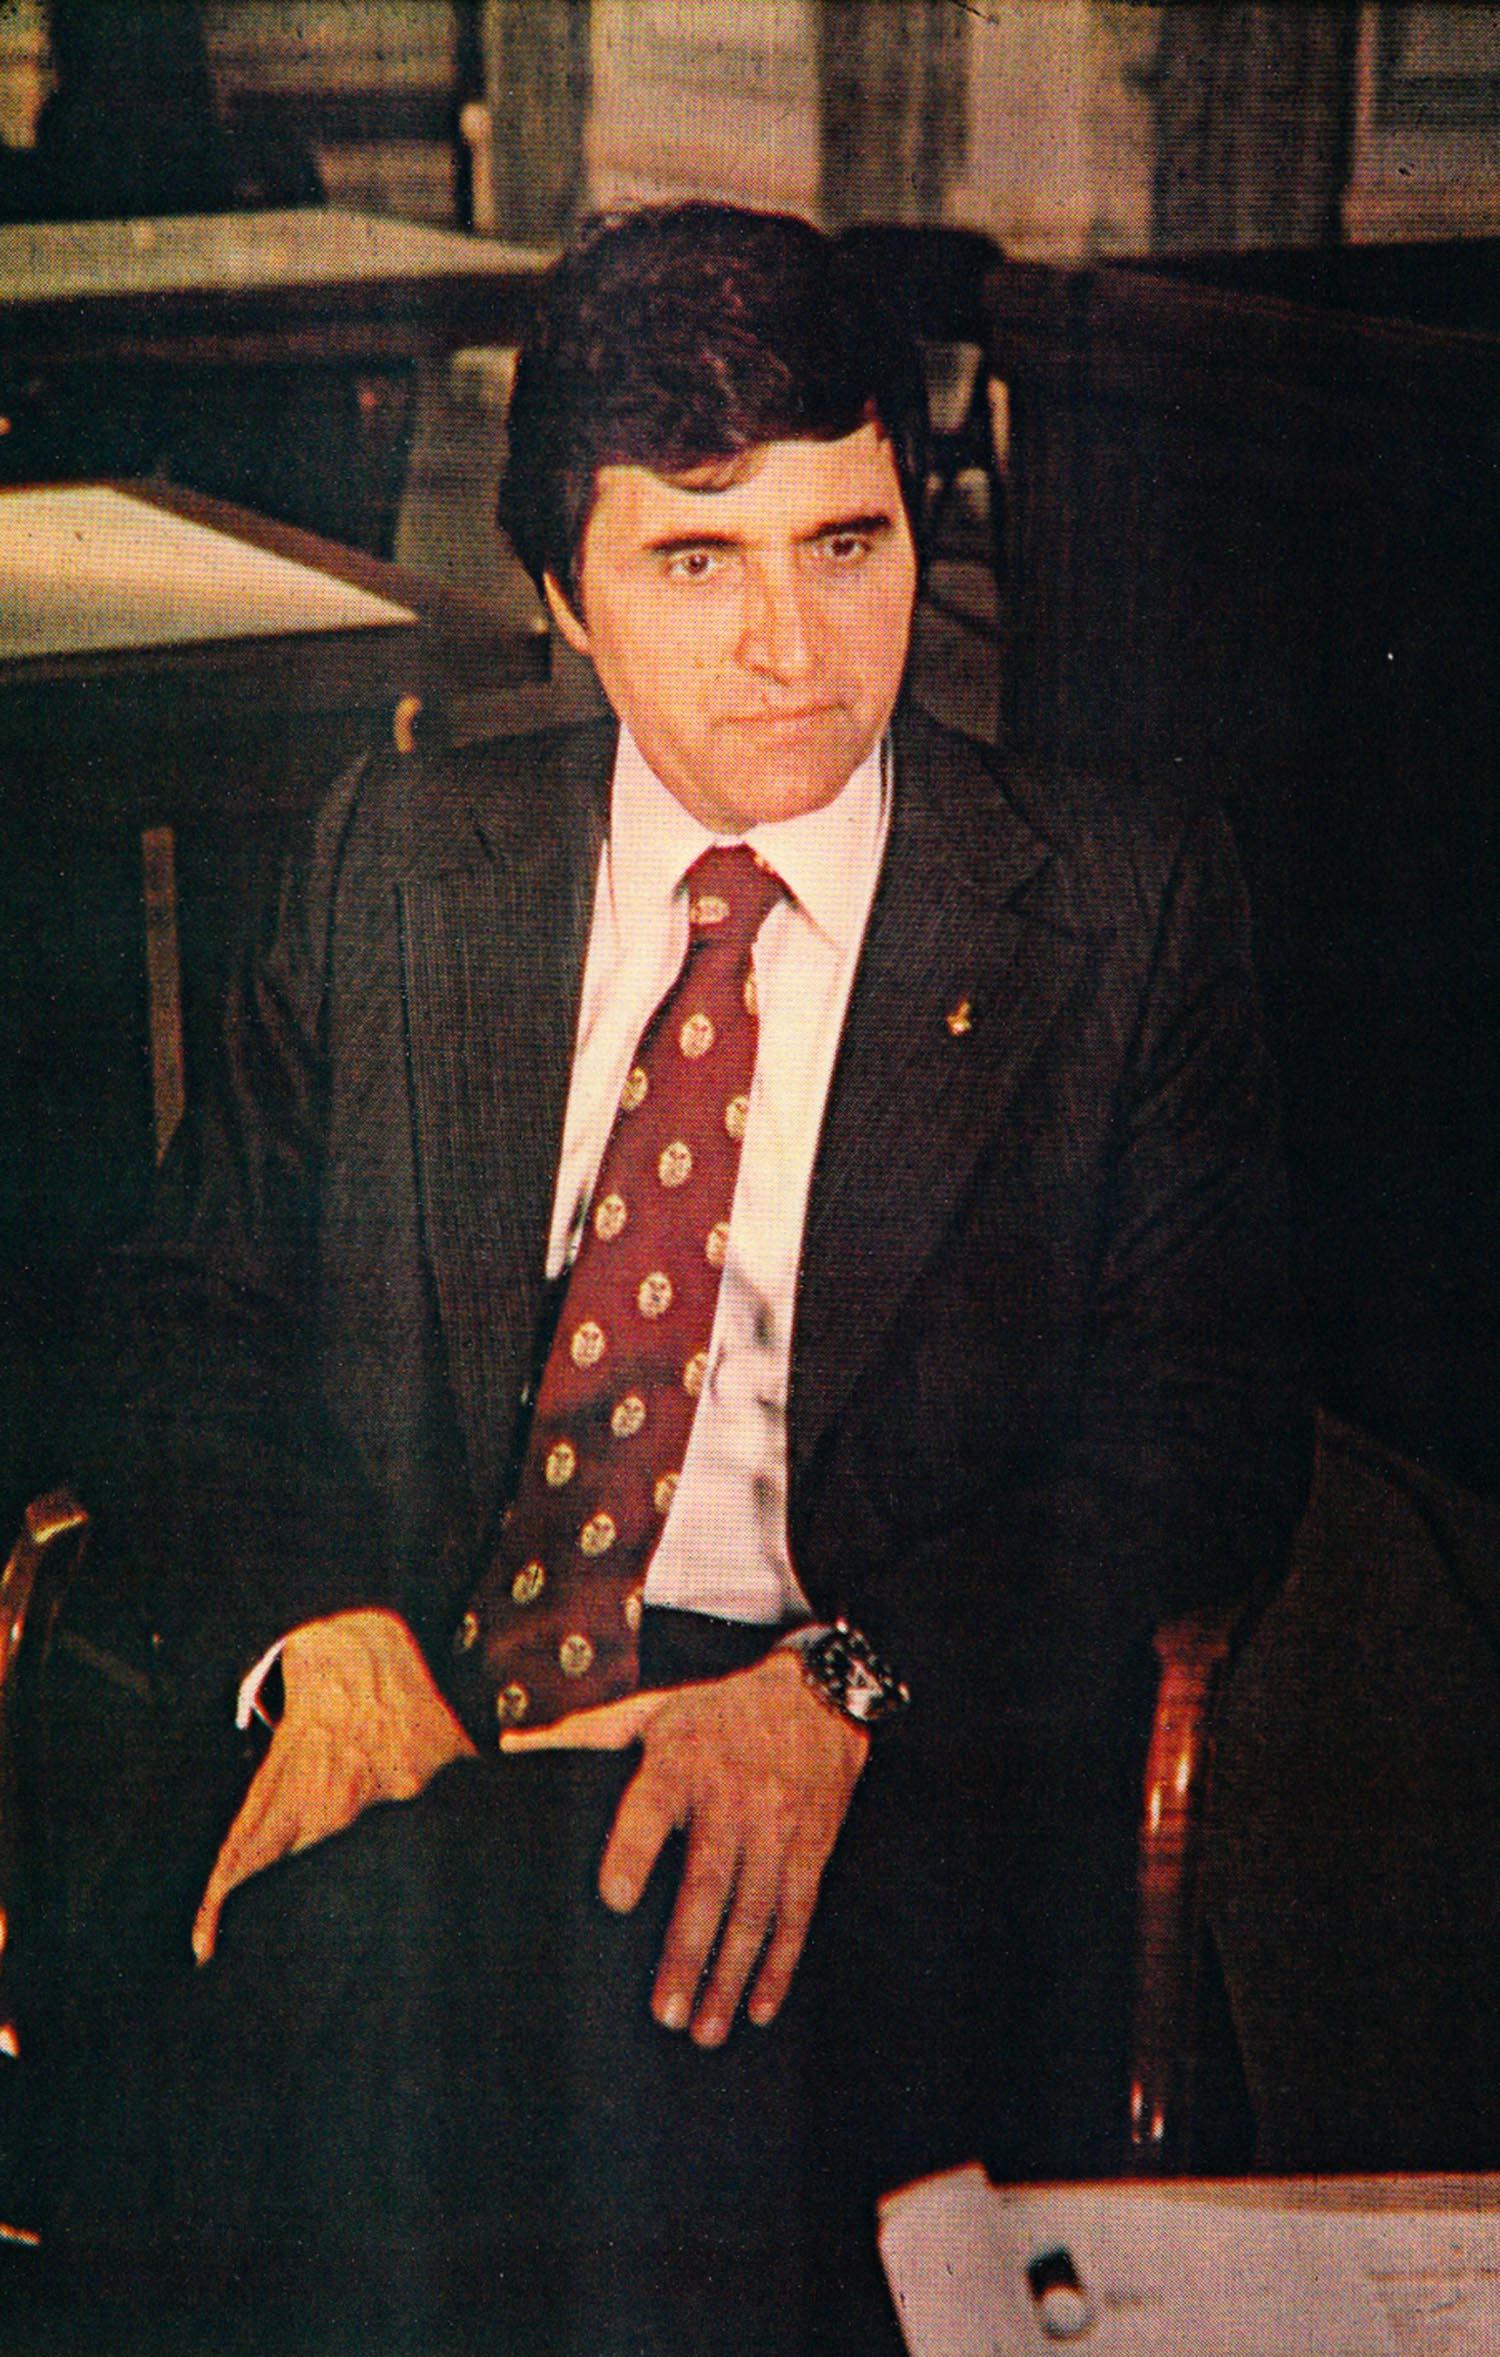 Miller & Ringma, Portrait of Harrison Schmitt, 1976